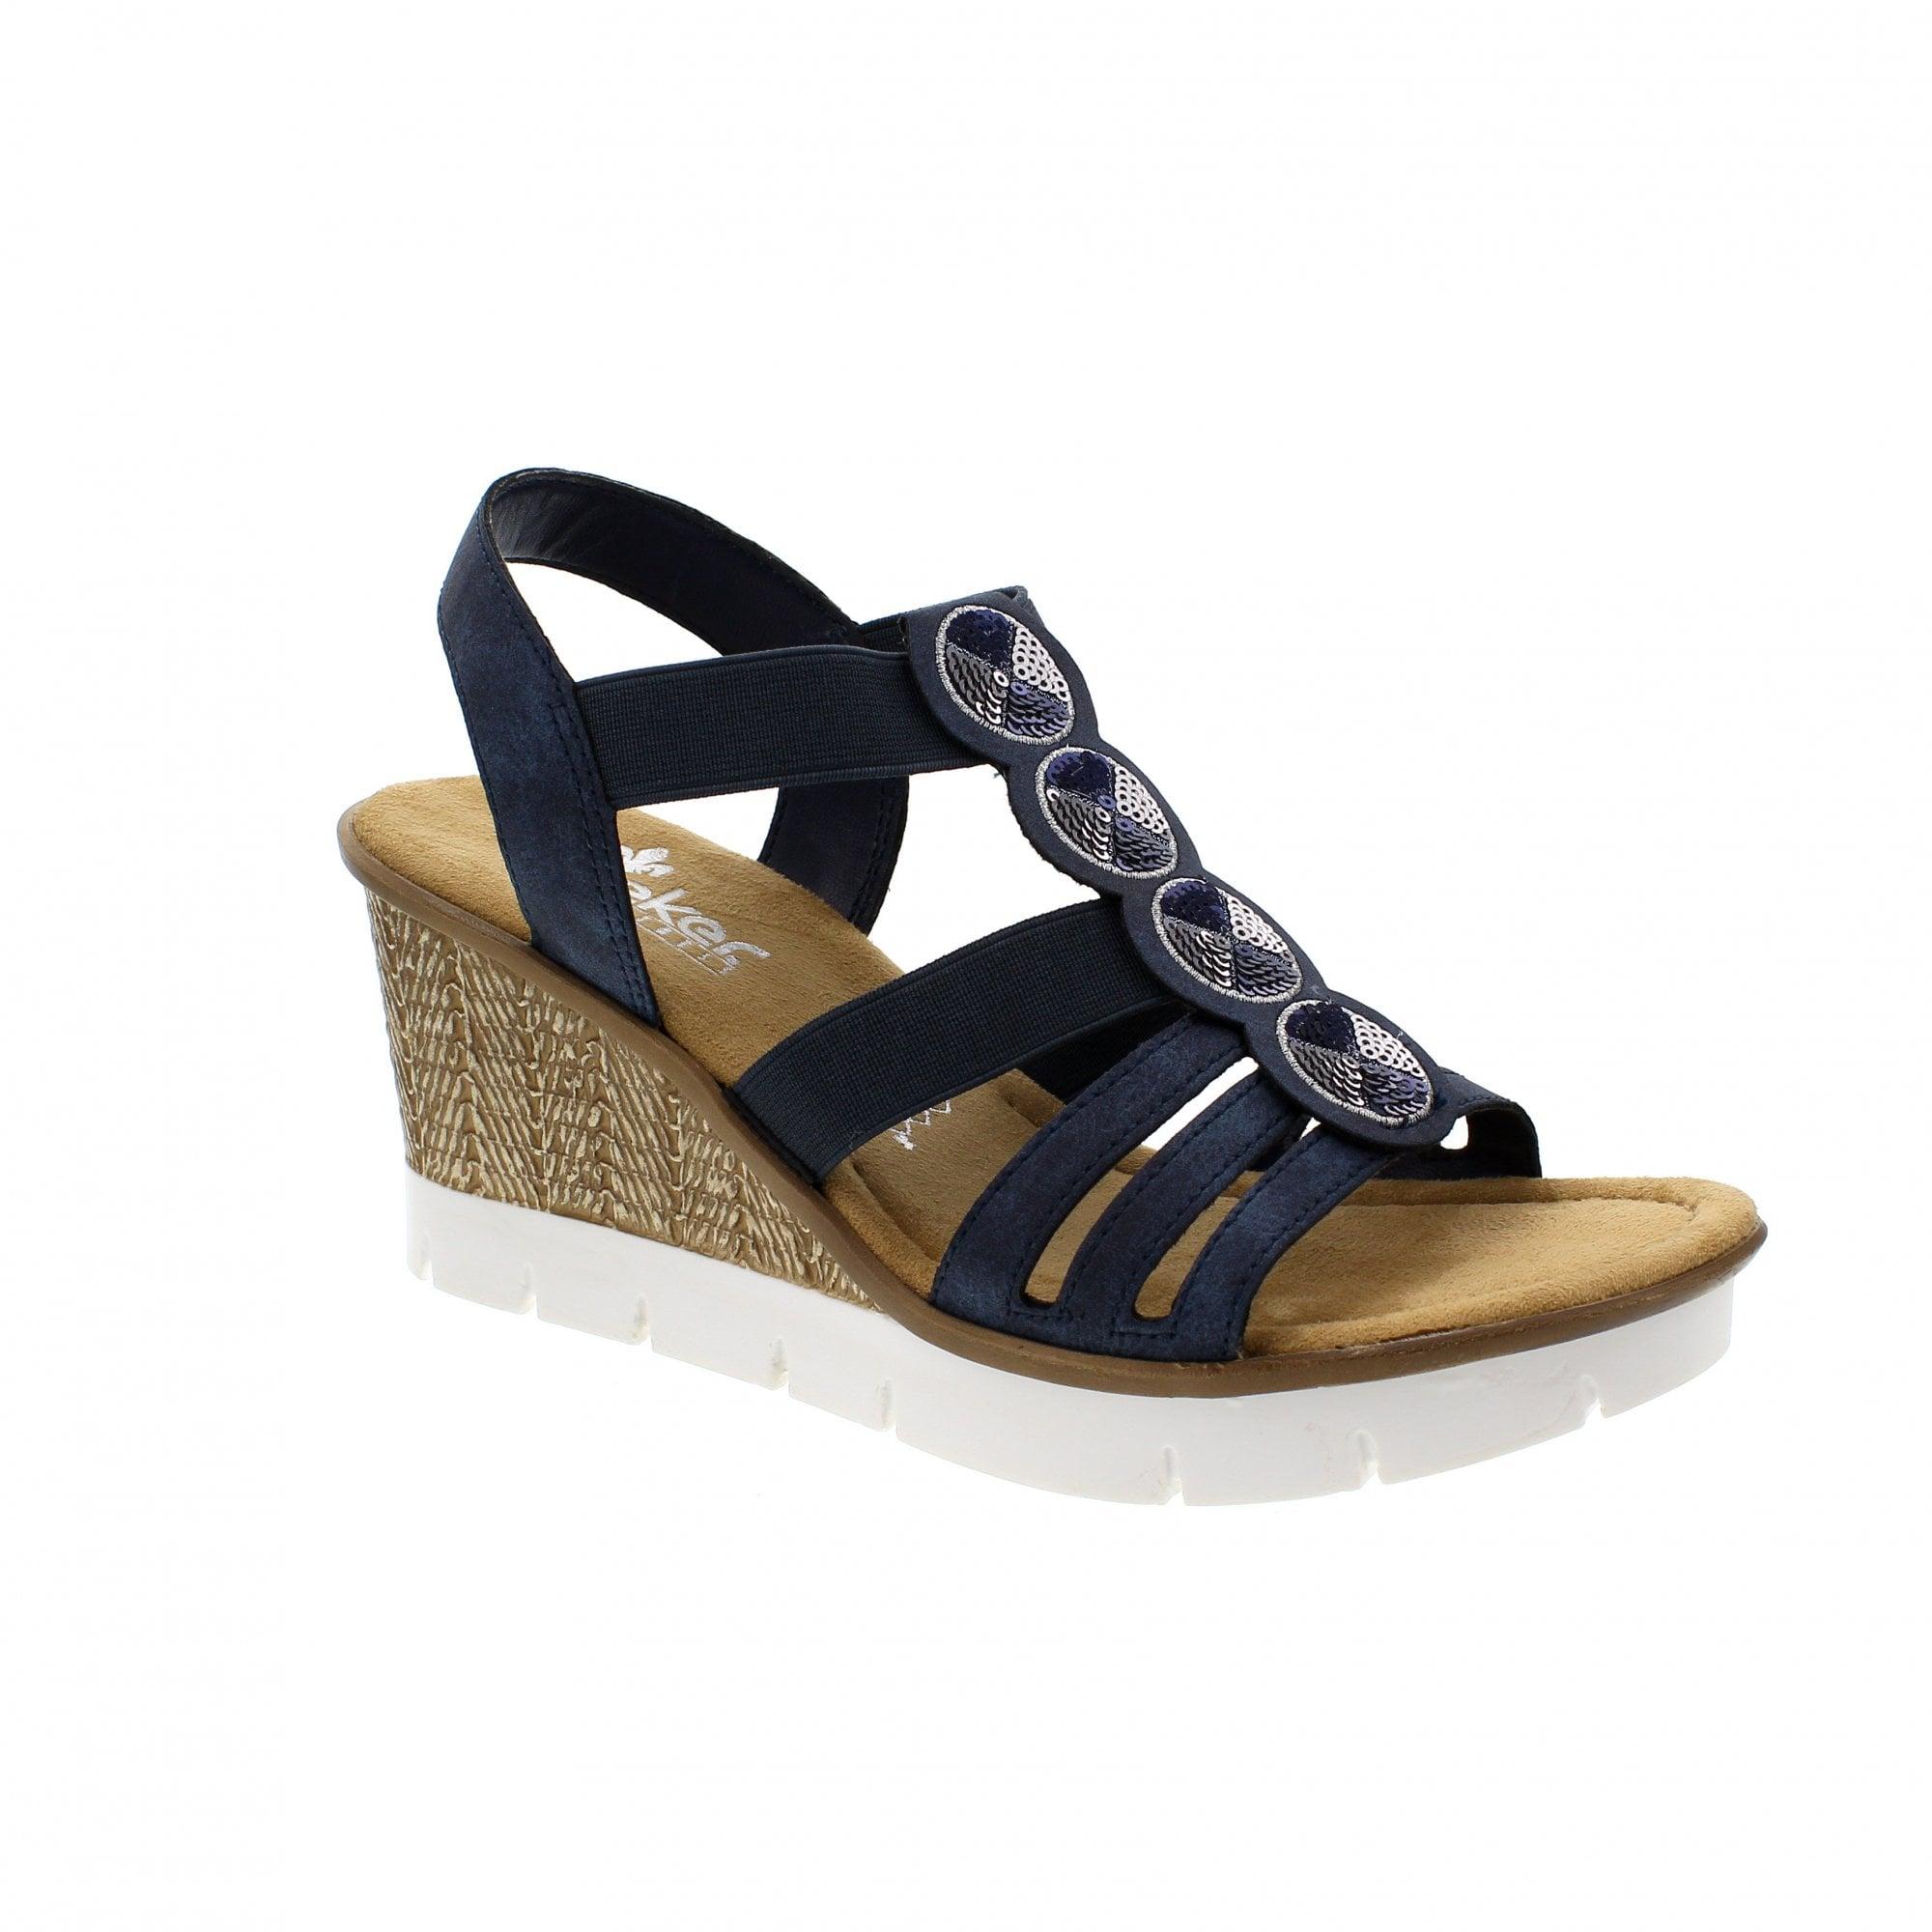 b55c60ee3 Rieker 65515-14 Navy Womens Wedge Sandals